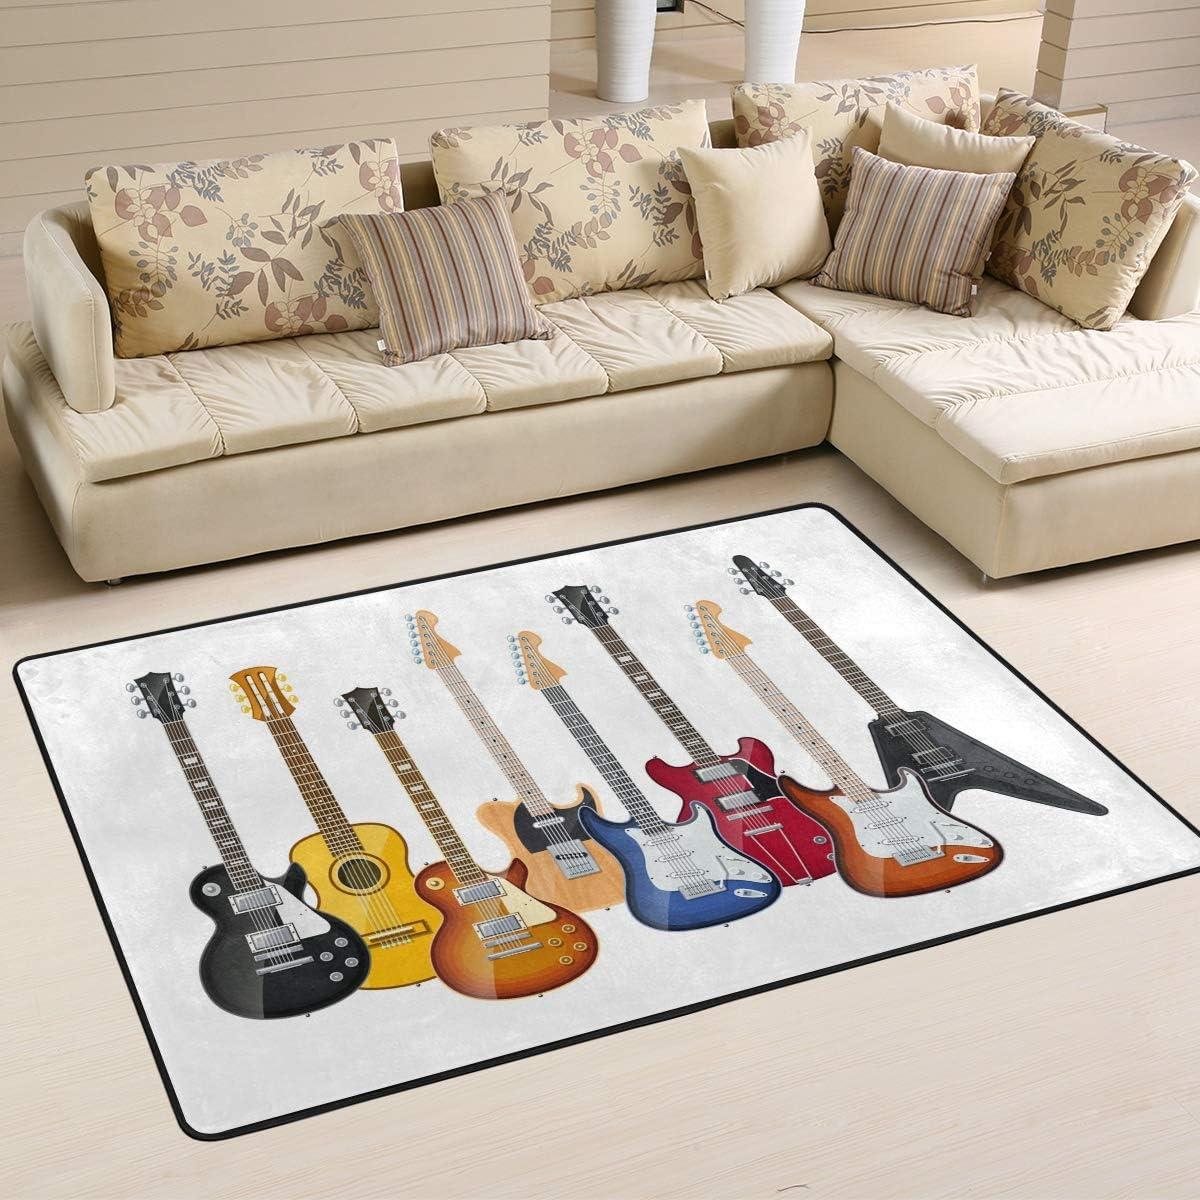 WIHVE Electric Guitars Non Slip Area Rugs Living Room Carpet Bedroom Rug